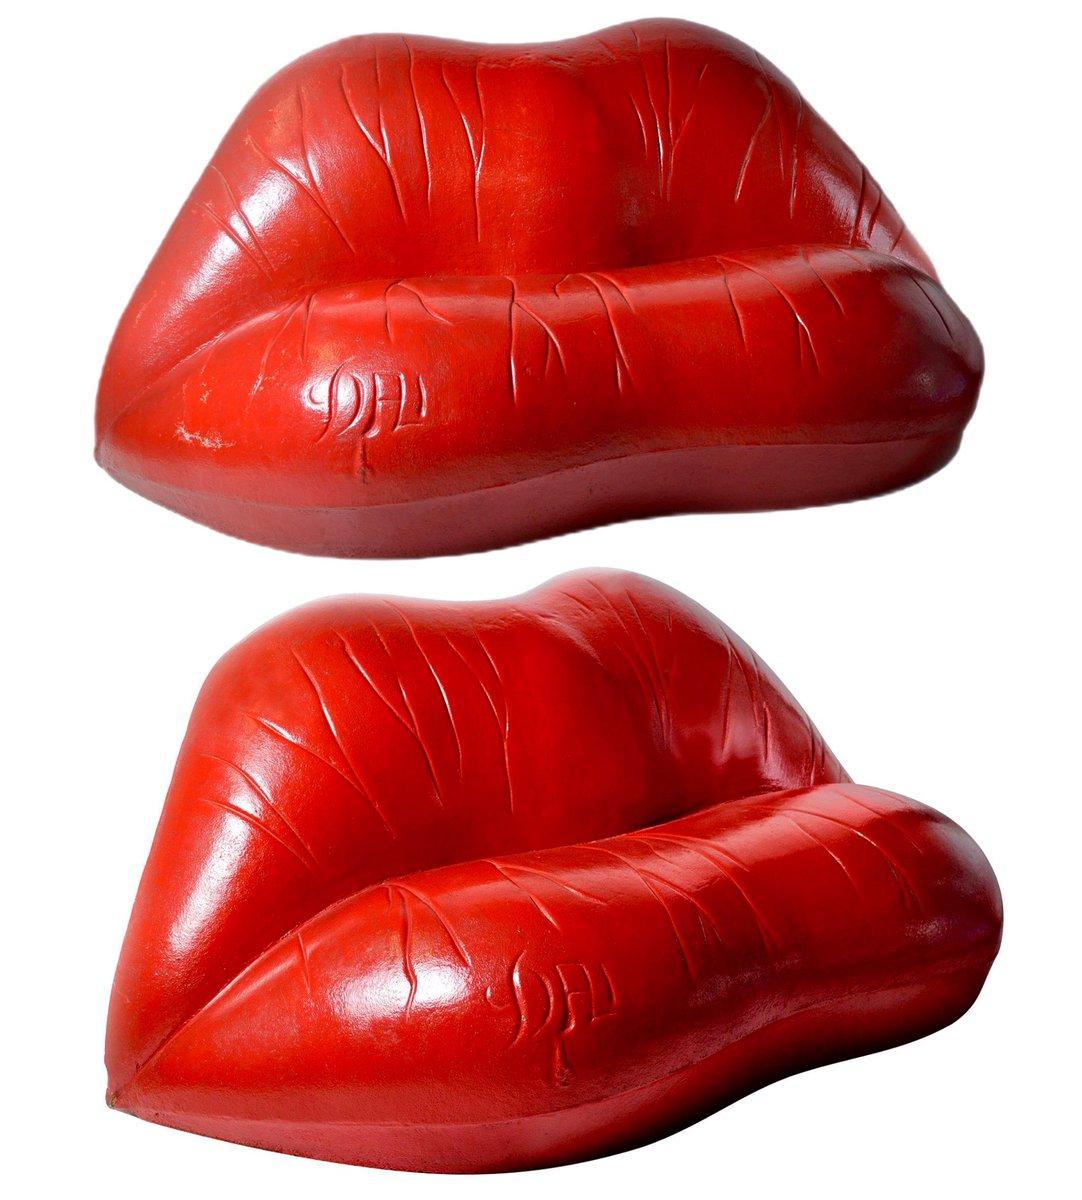 Salvador Dali x Oscar Tusquets Red Lips 'Salivasofa' Sofa Prototype (1972). https://t.co/LA3n4YcP3D